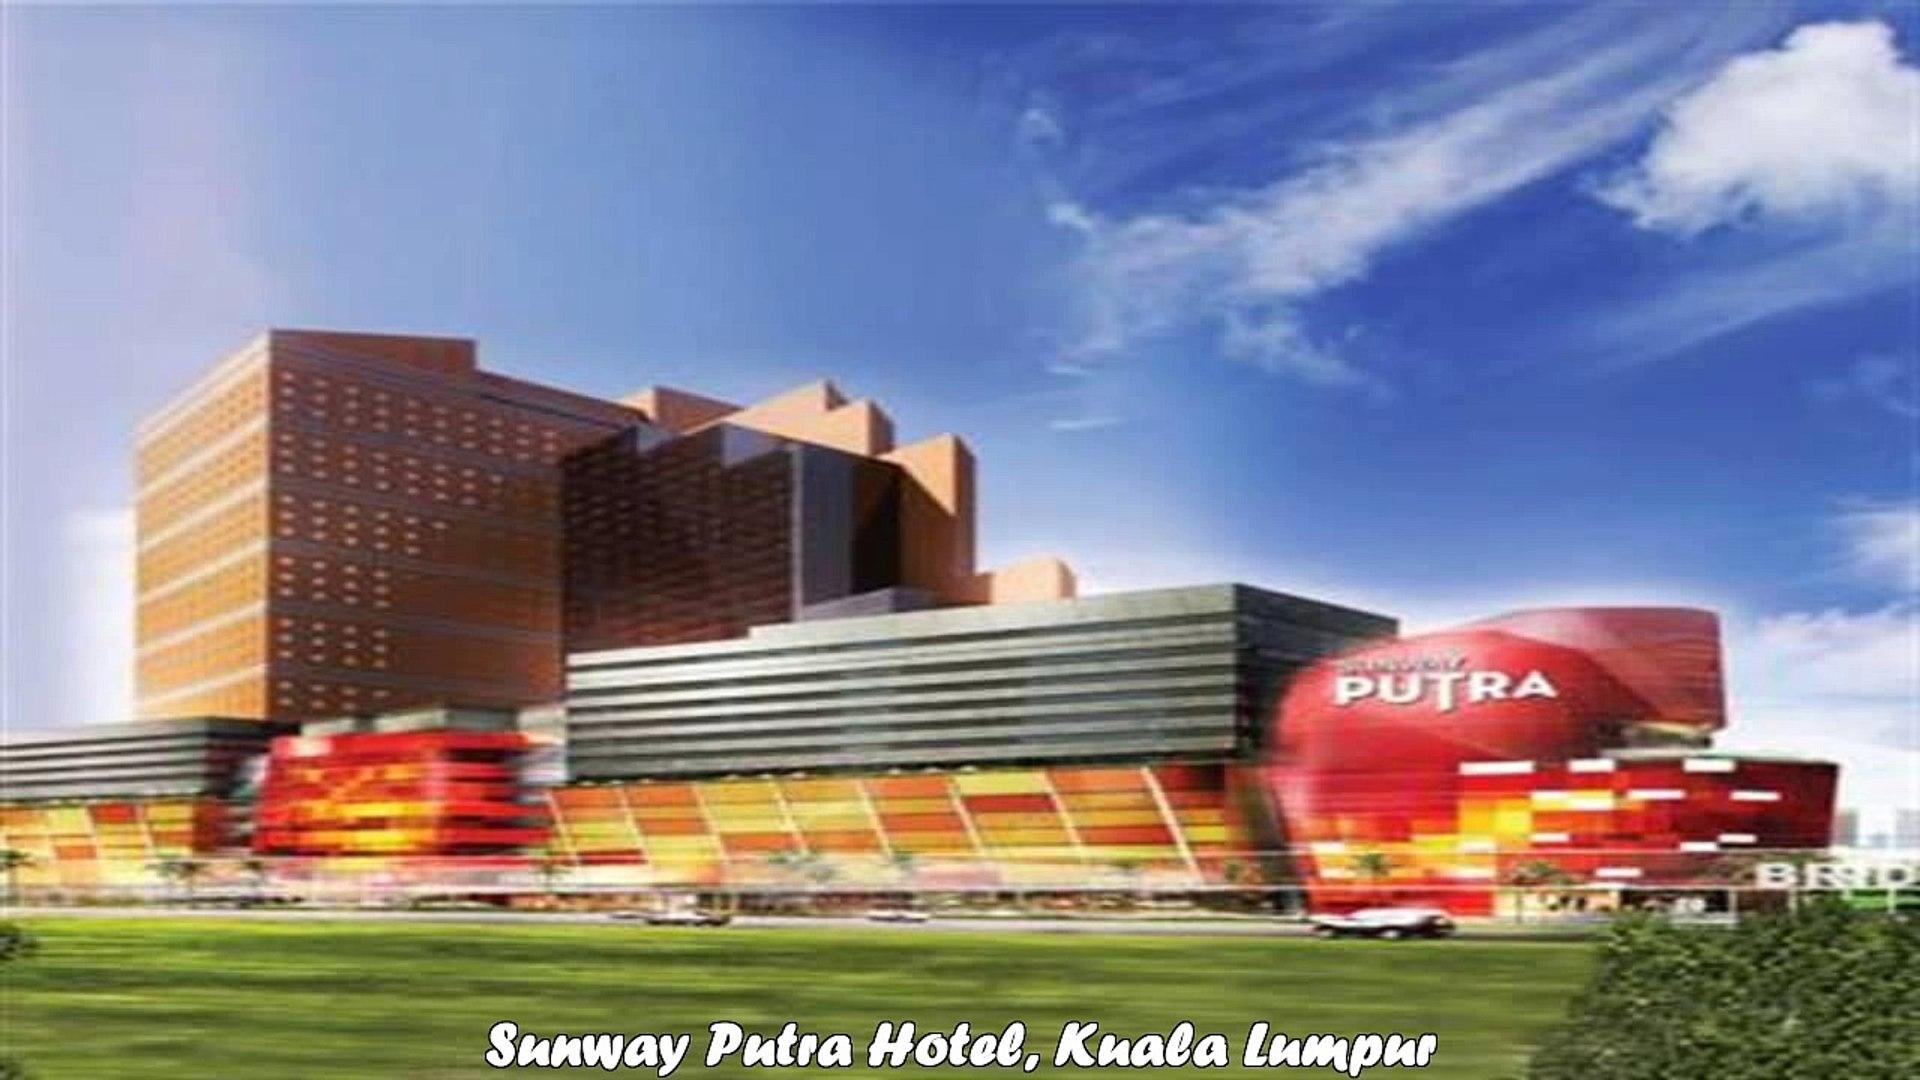 Hotels in Kuala Lumpur Sunway Putra Hotel Kuala Lumpur Malaysia